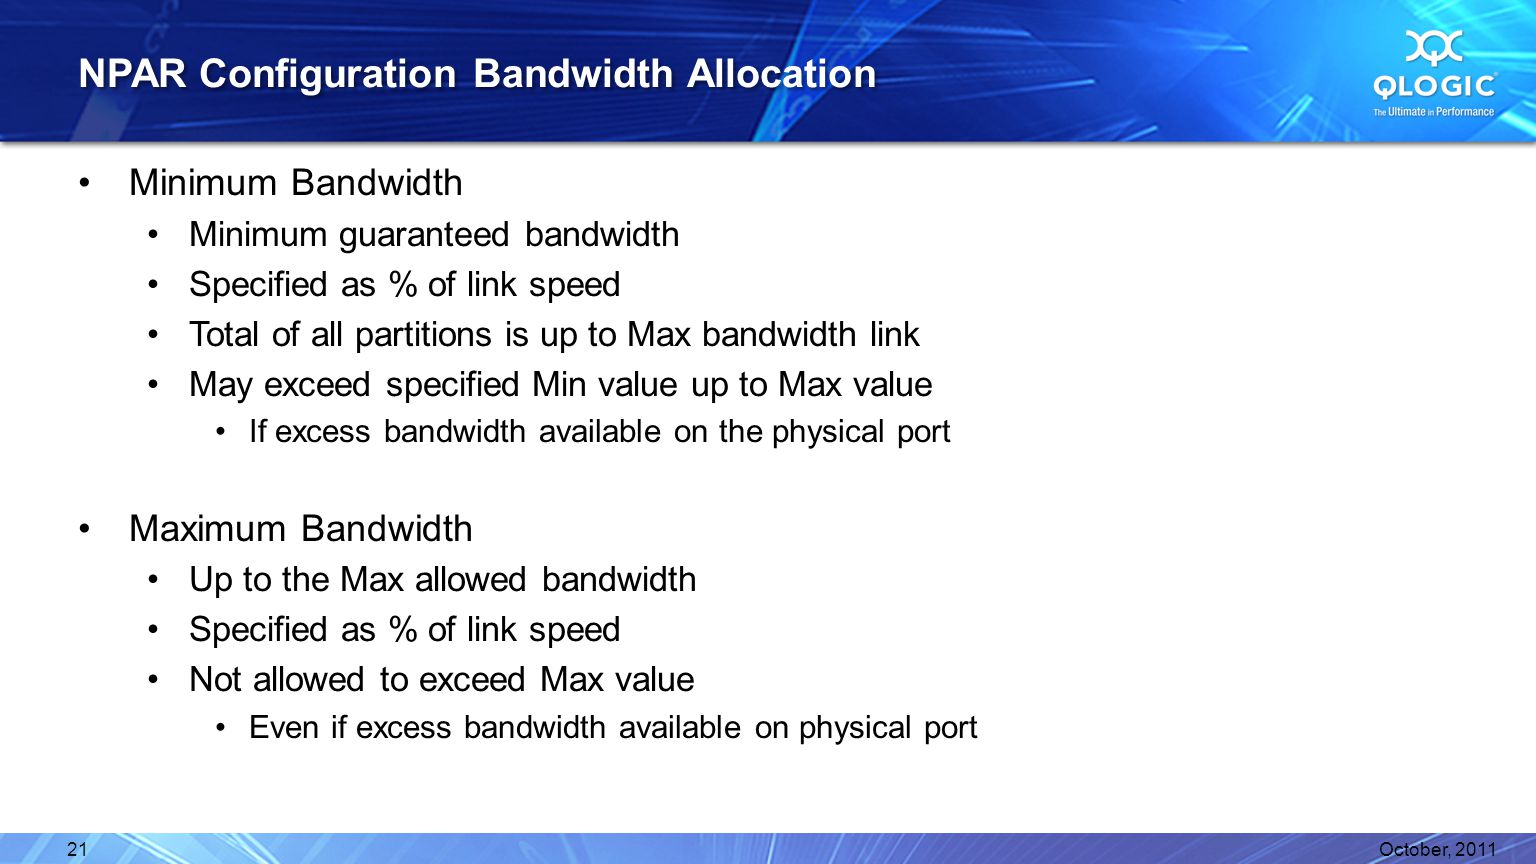 NPAR Configuration Bandwidth Allocation